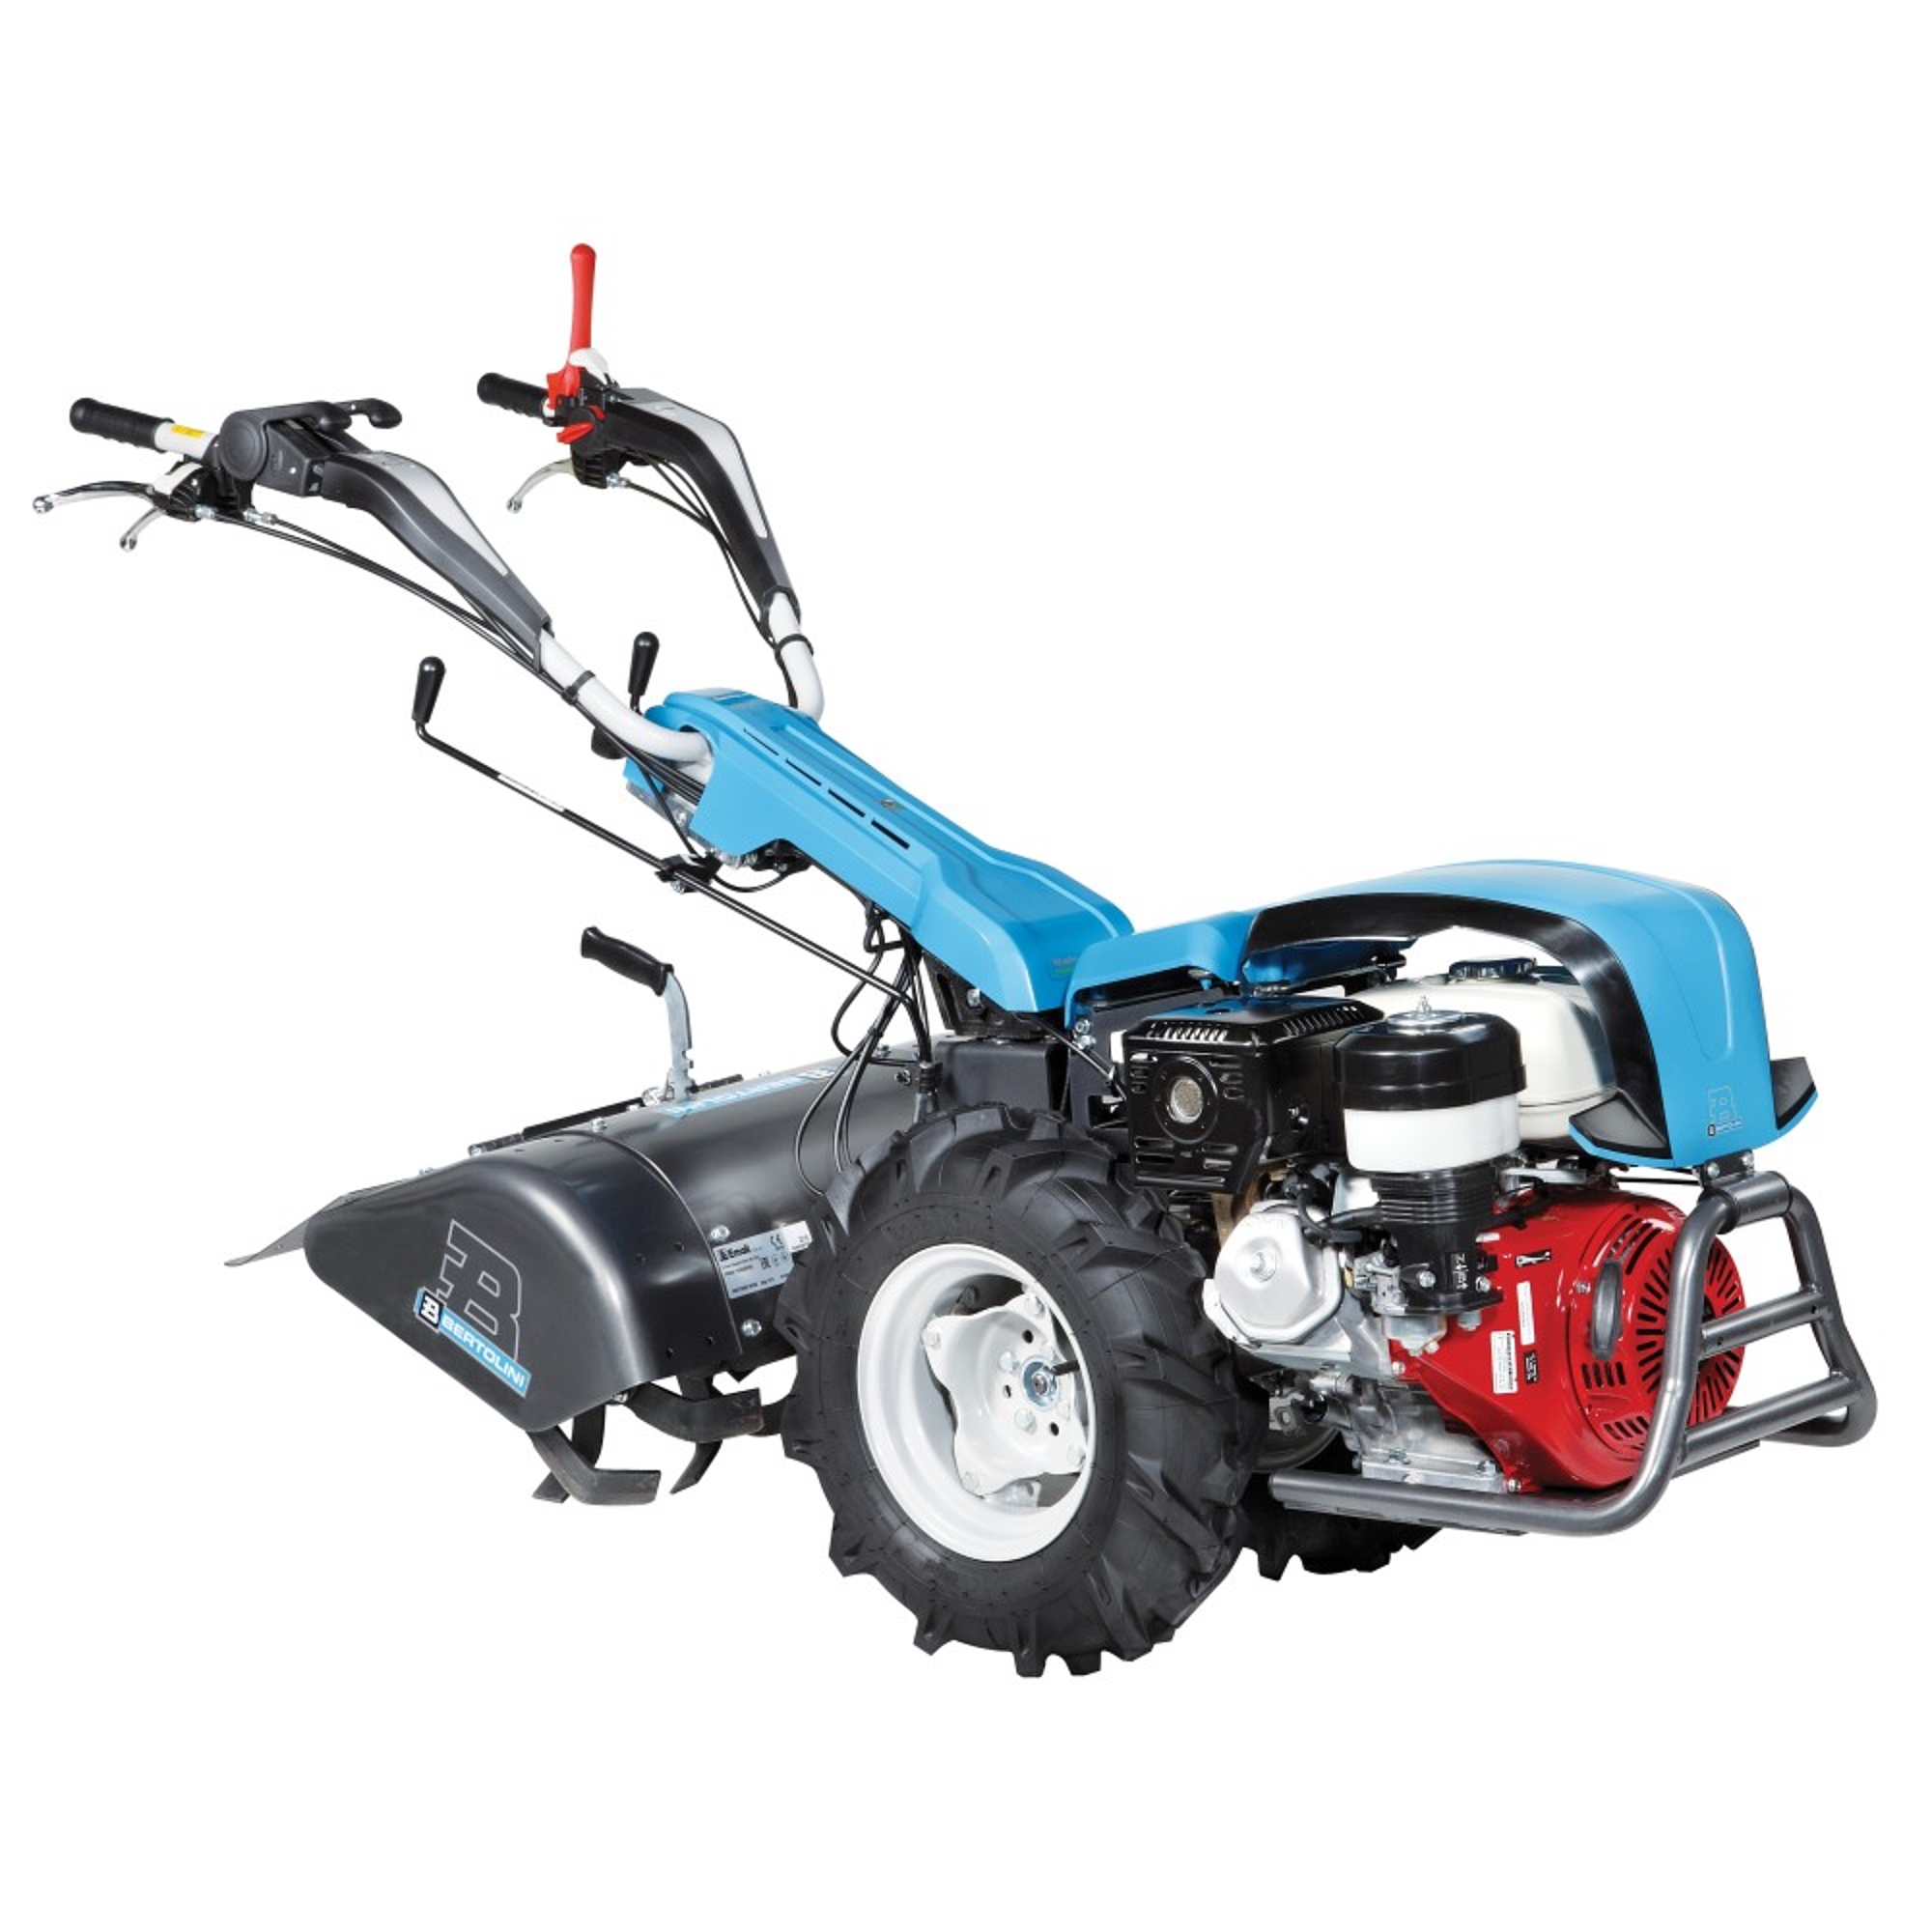 Bertolini Kultivátor Alapgép BT 413 S Honda GX 270 OHV motorral 683229201EN